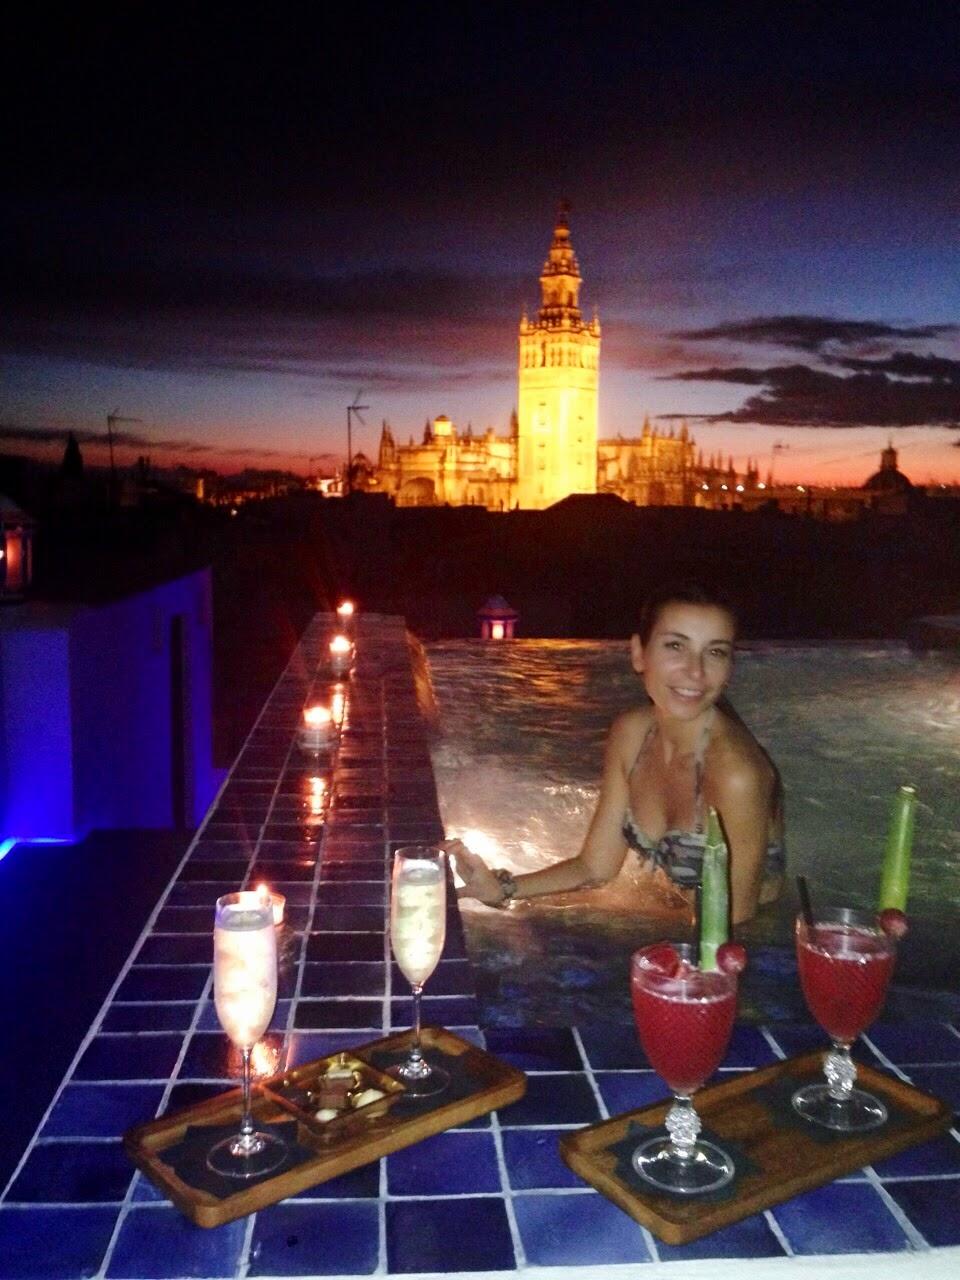 Baos rabes Aire de Sevilla a la ultima life style